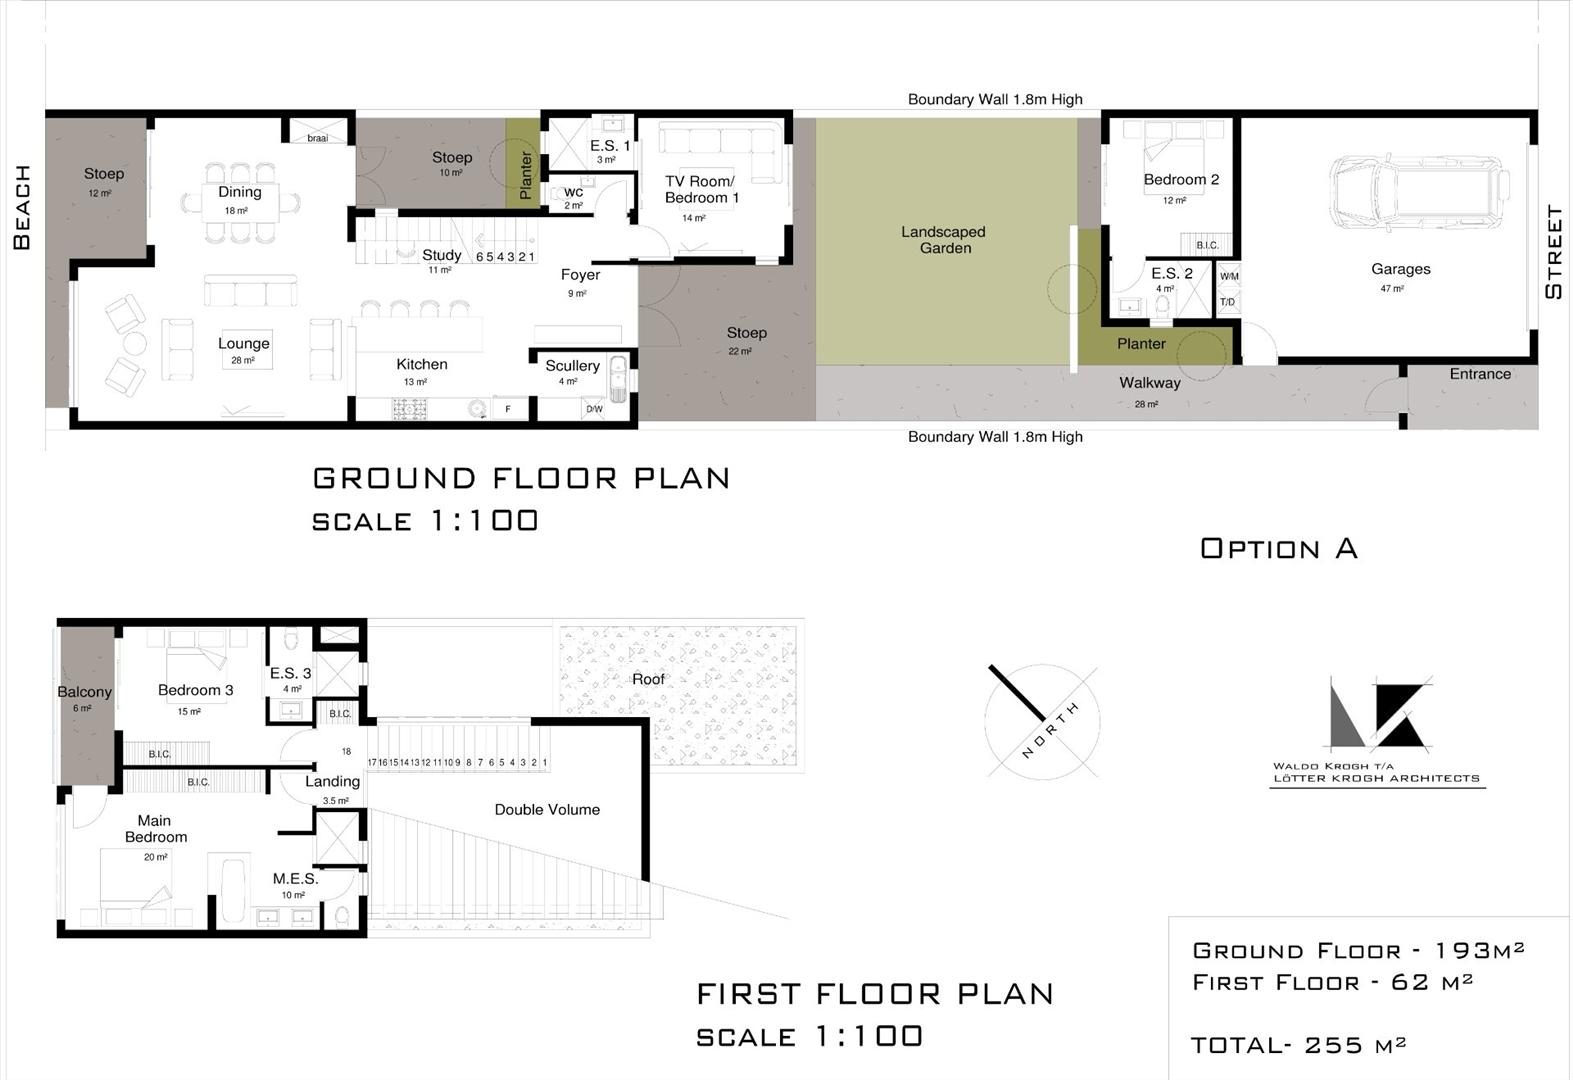 Option A floor plan